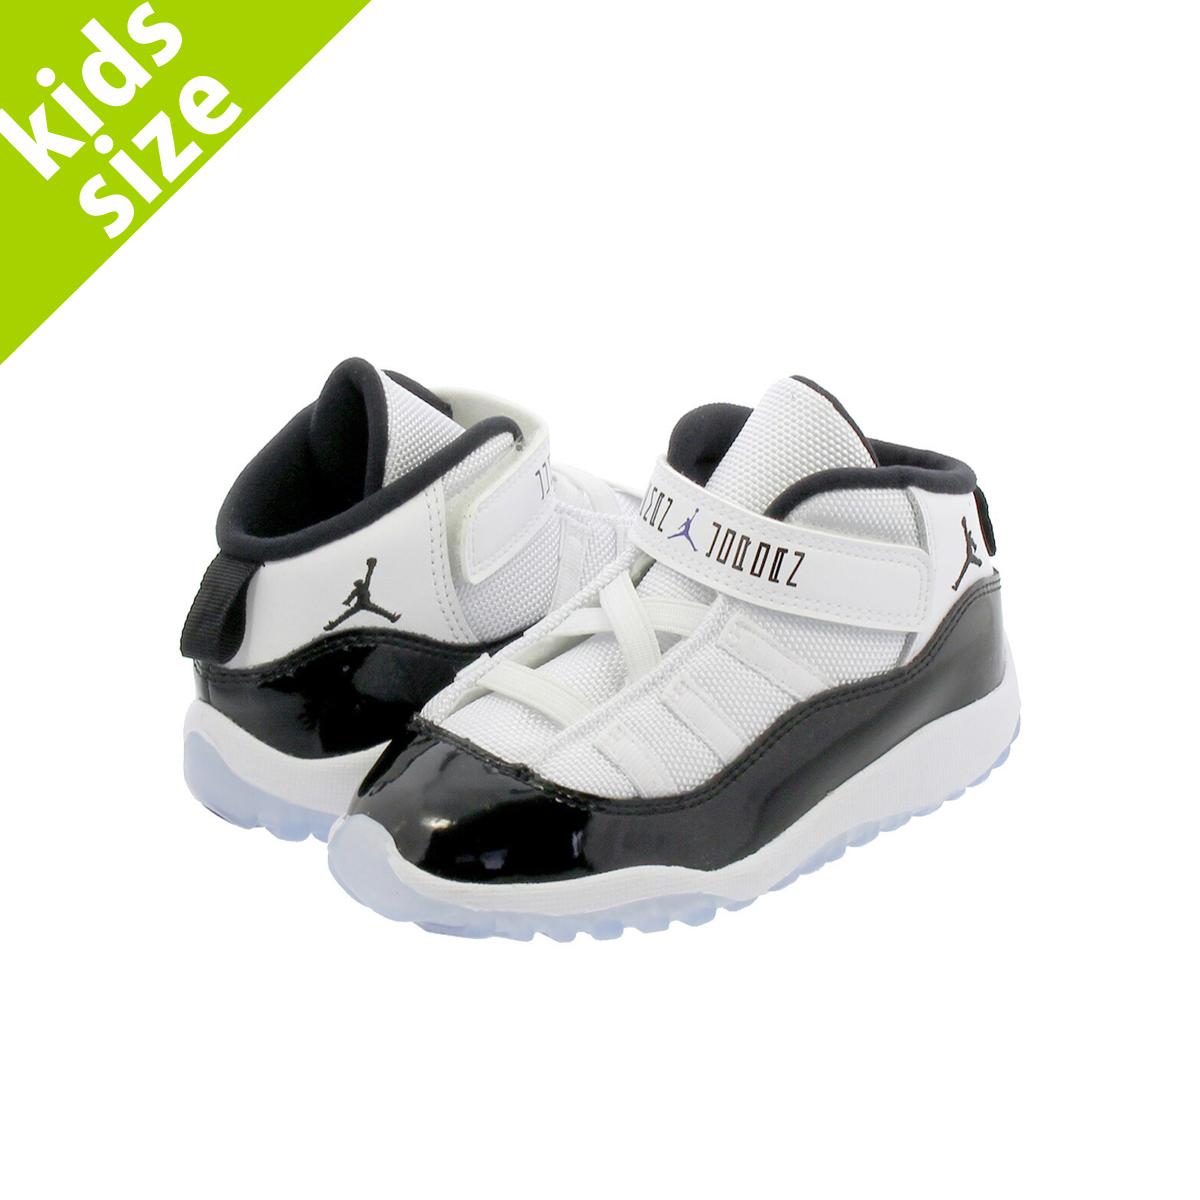 d5056d2ed027 NIKE AIR JORDAN 11 RETRO BT Nike Air Jordan 11 nostalgic BT WHITE CONCORD BLACK  378